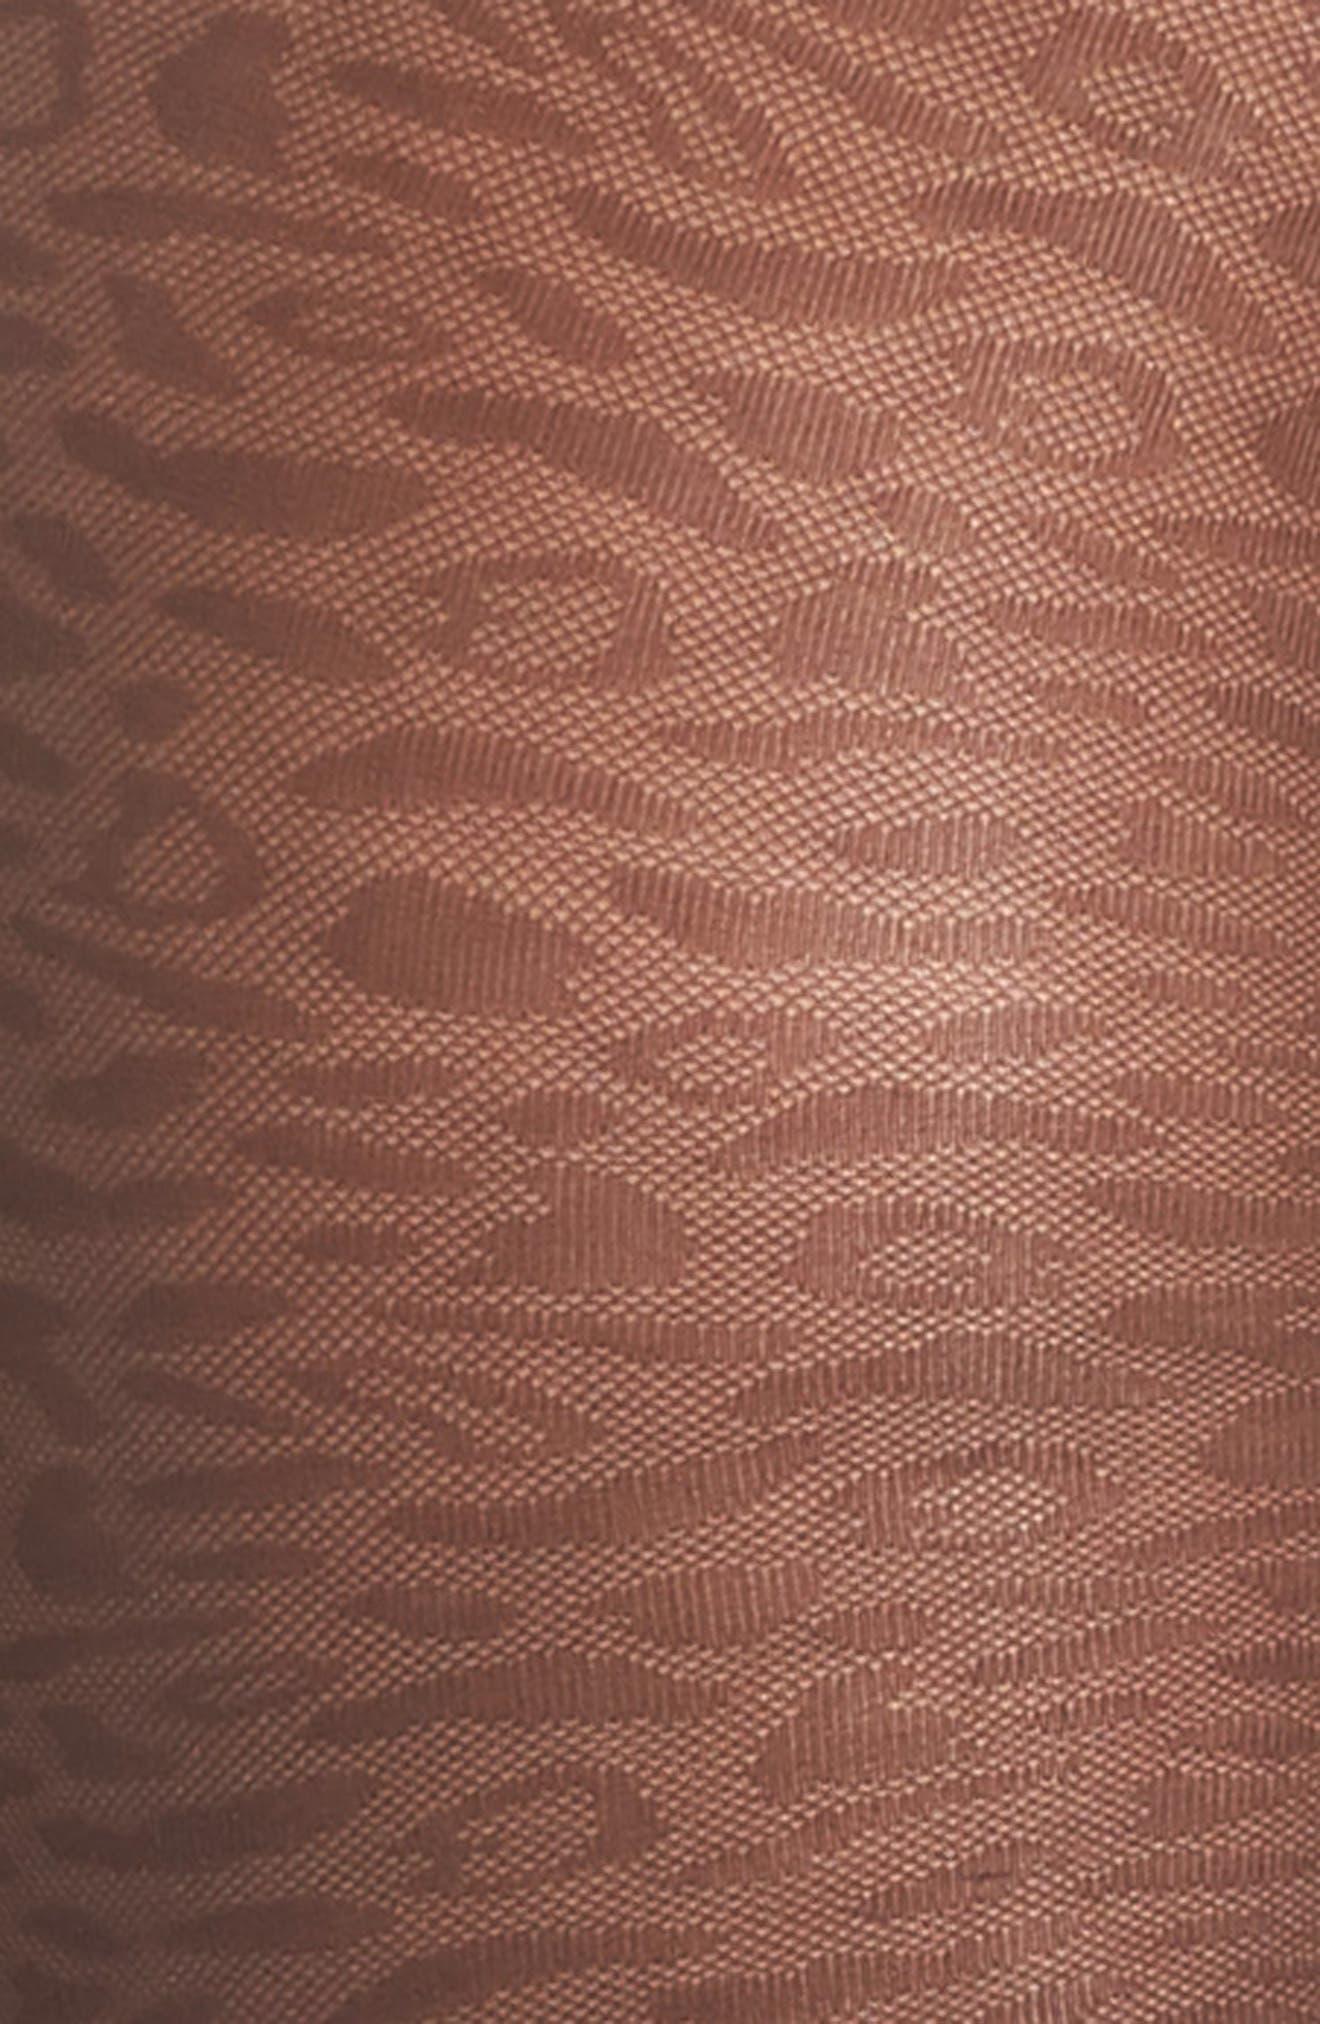 Emma Leopard Tights,                             Alternate thumbnail 2, color,                             205